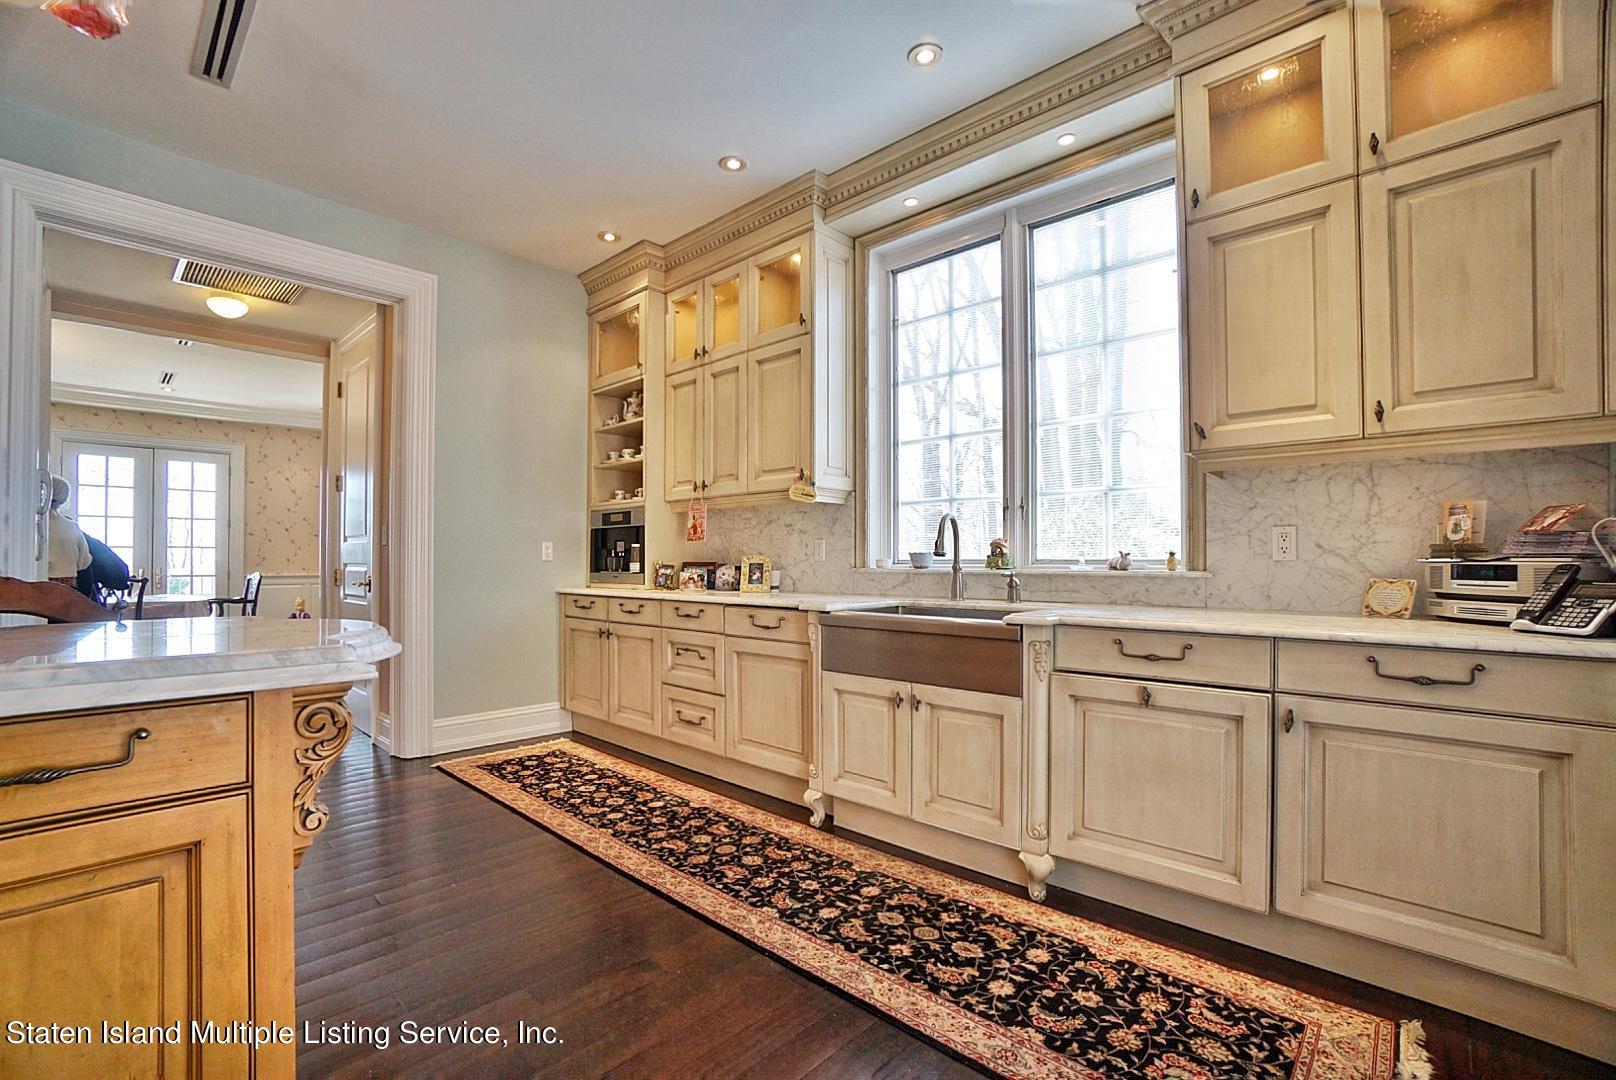 Single Family - Detached 129 Coverly Avenue   Staten Island, NY 10301, MLS-1144490-25